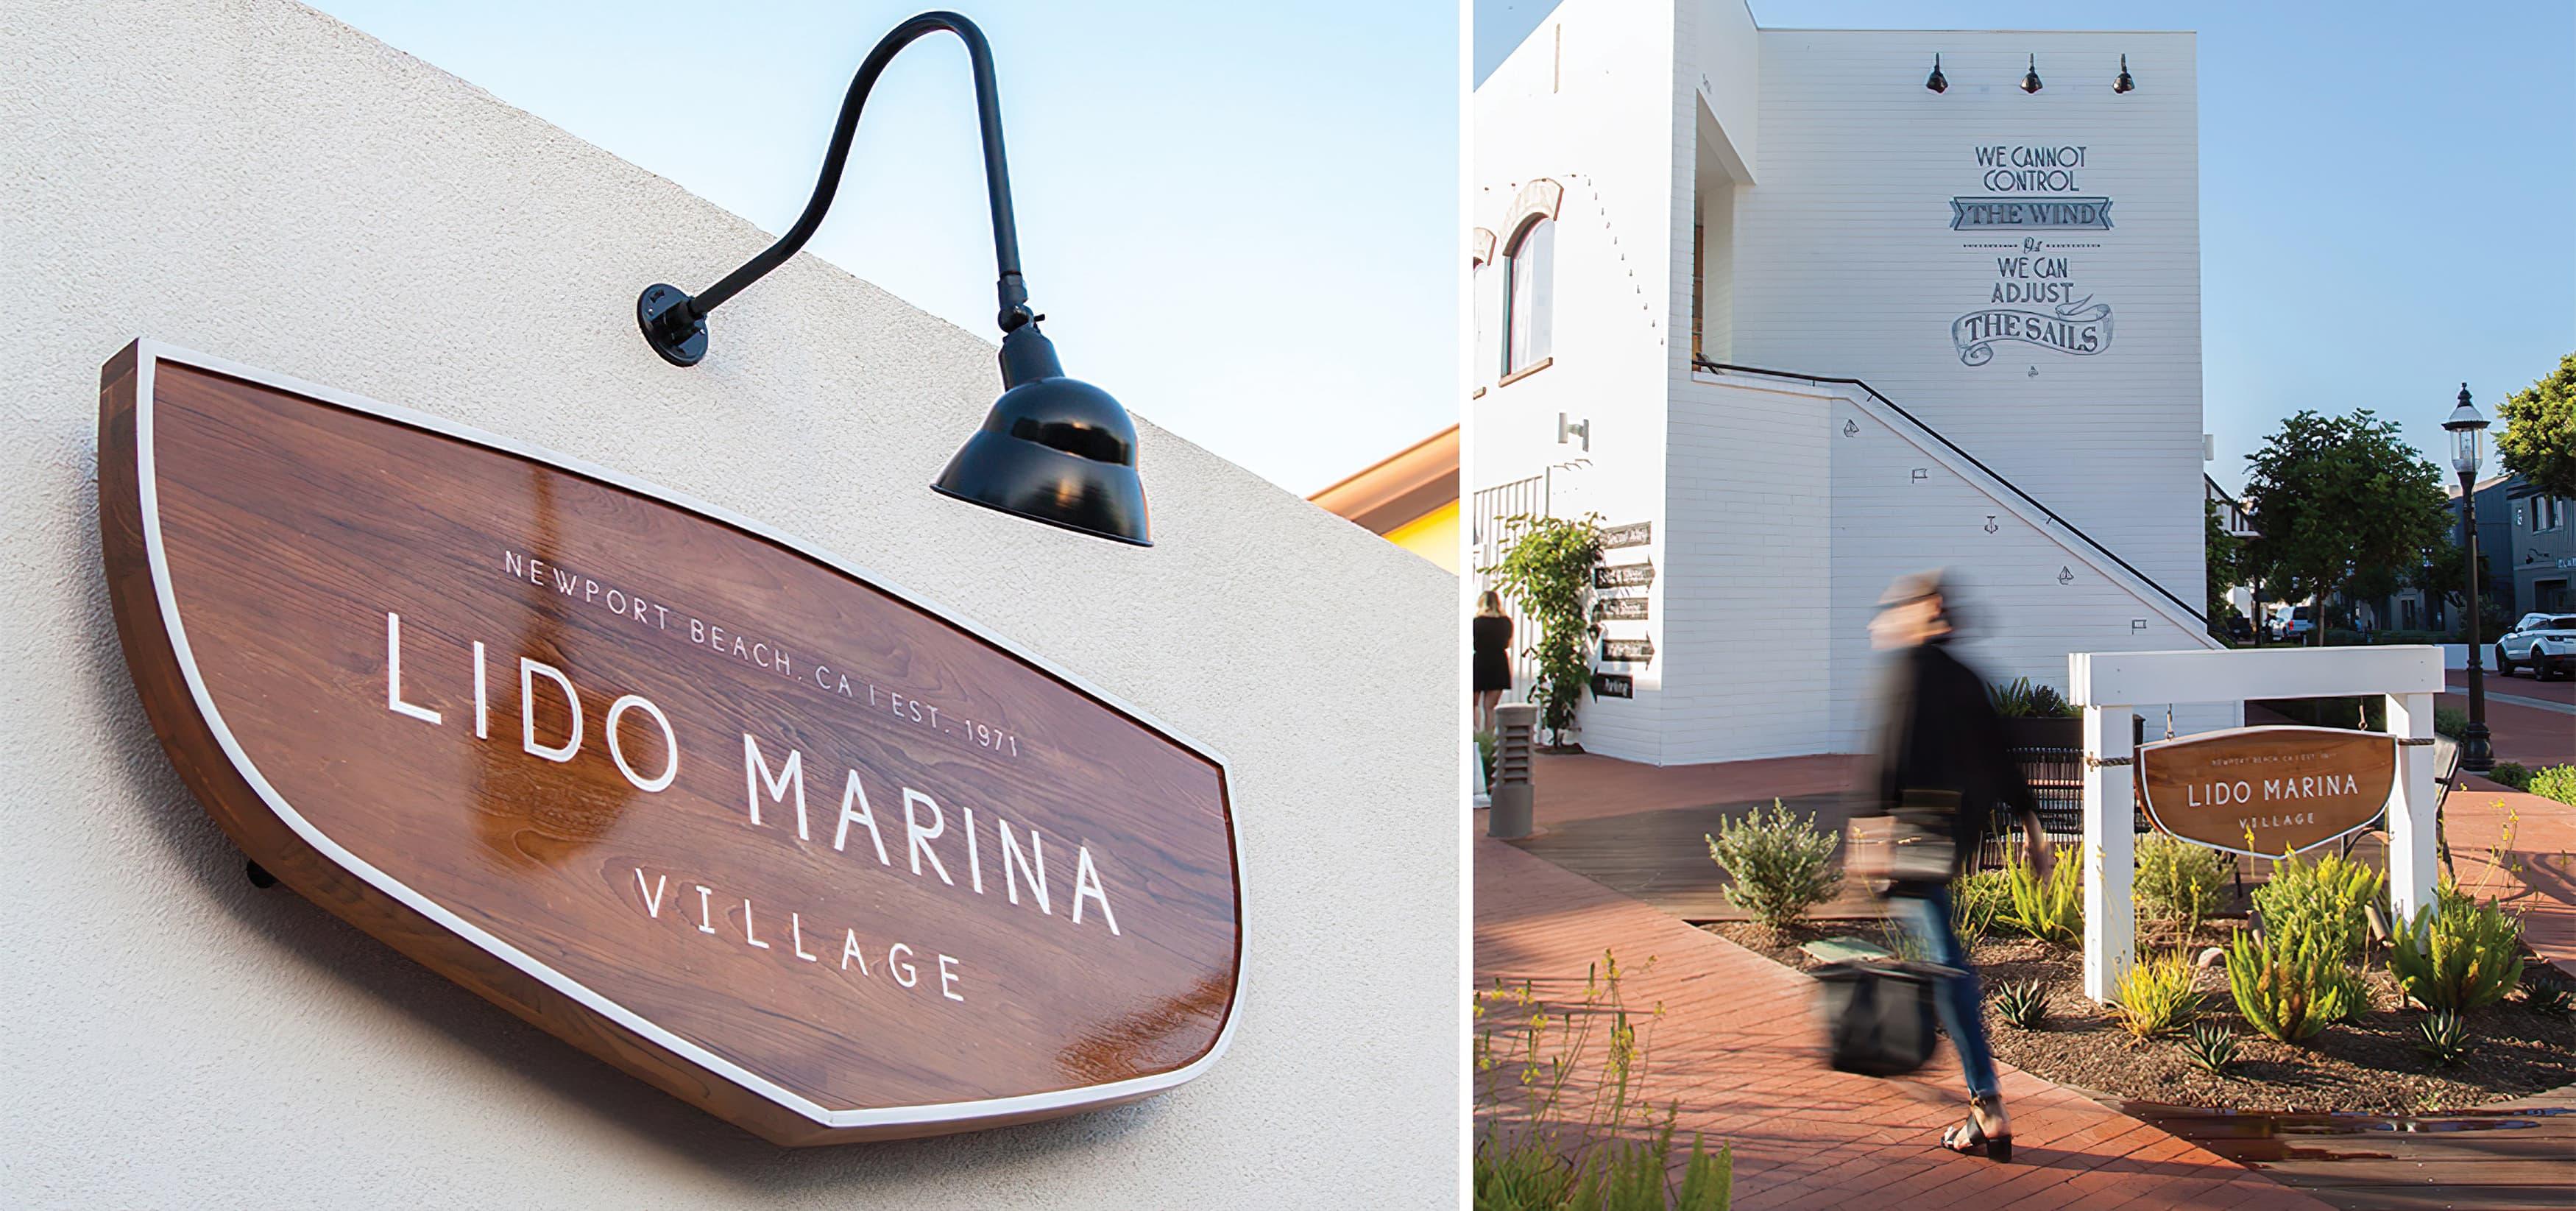 Lido Marina Village Newport Beach wooden project identity sign